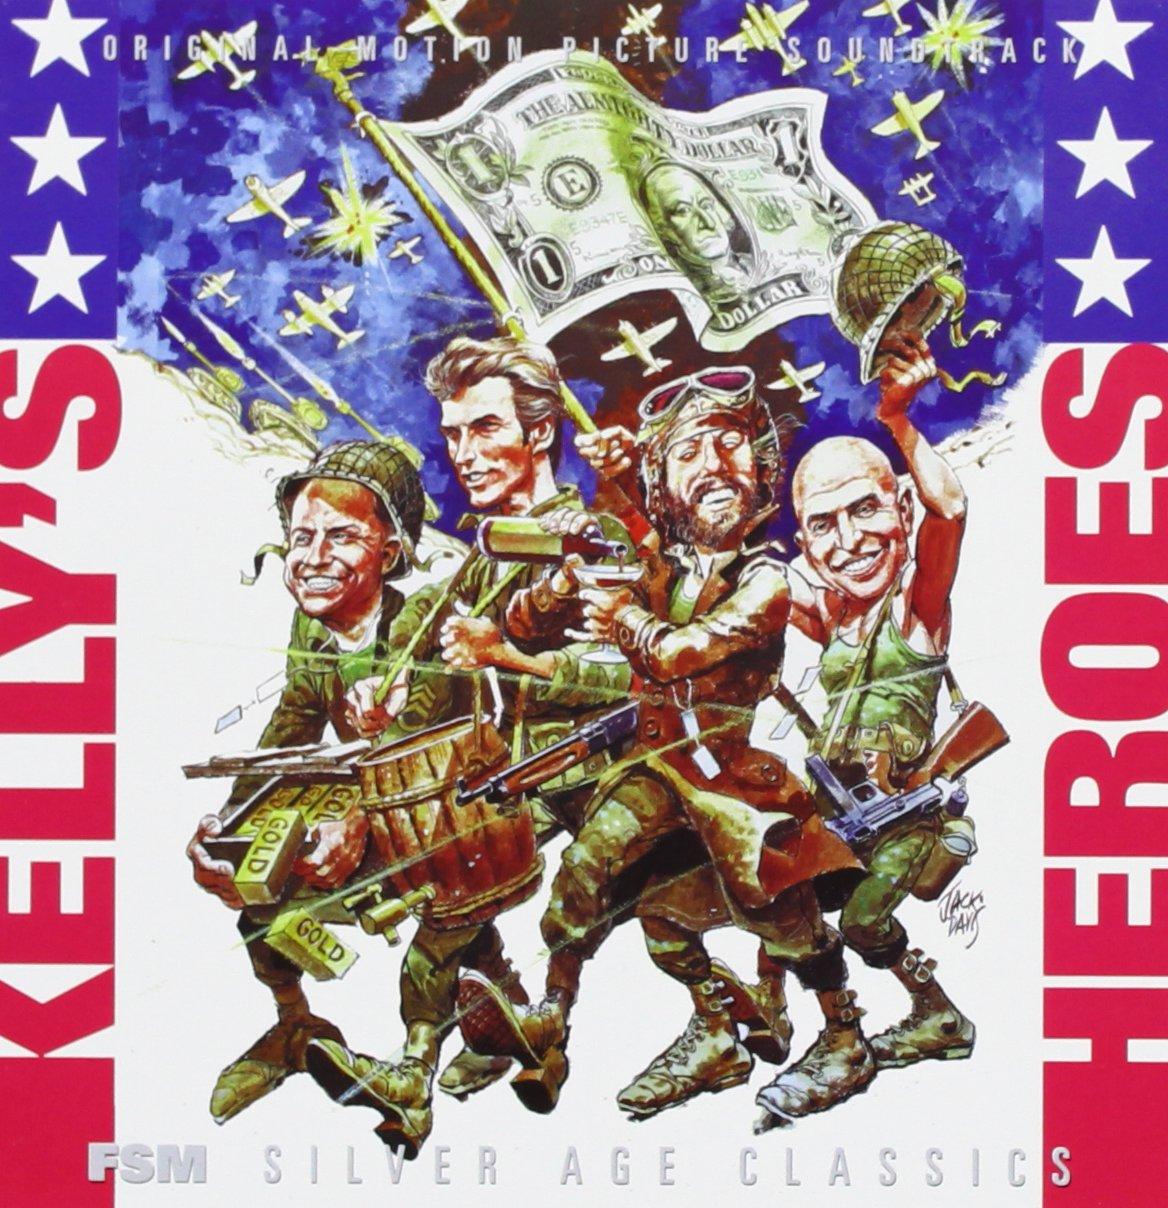 SALENEW very popular! Kelly's Sale Special Price Heroes